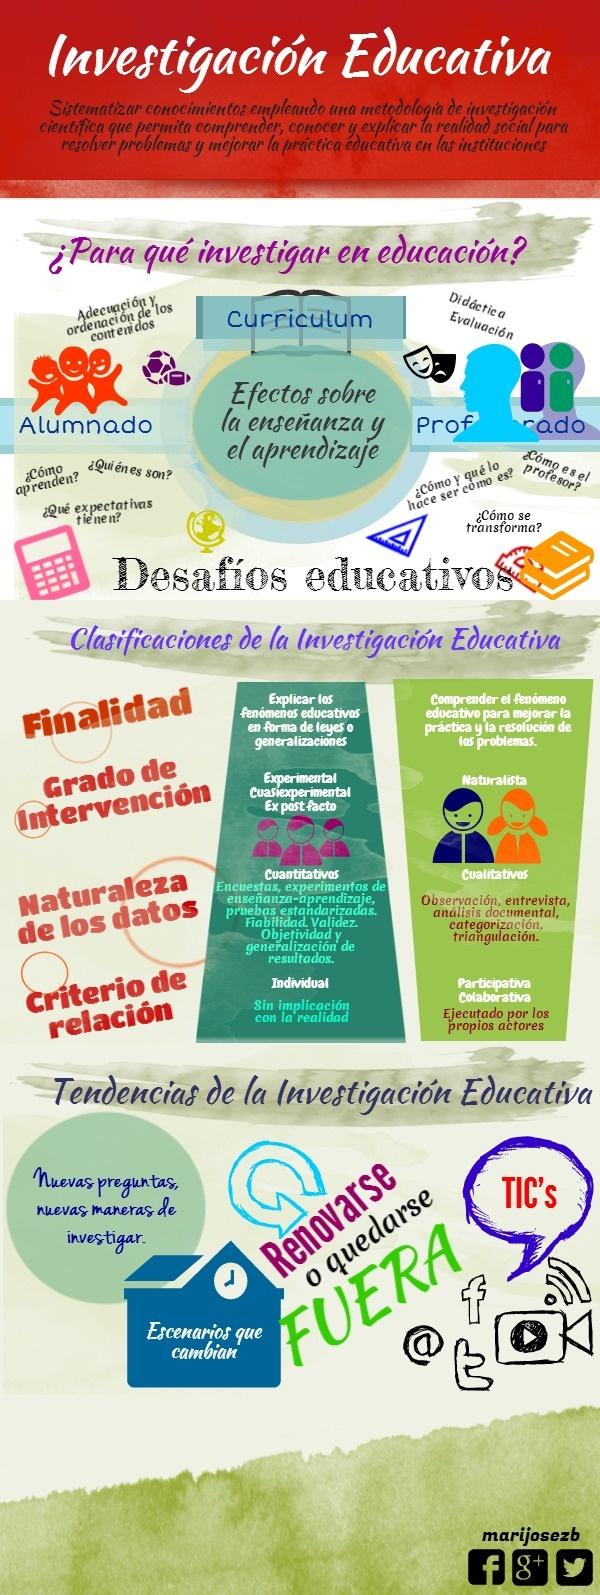 investigación educativa   @Piktochart Infographic